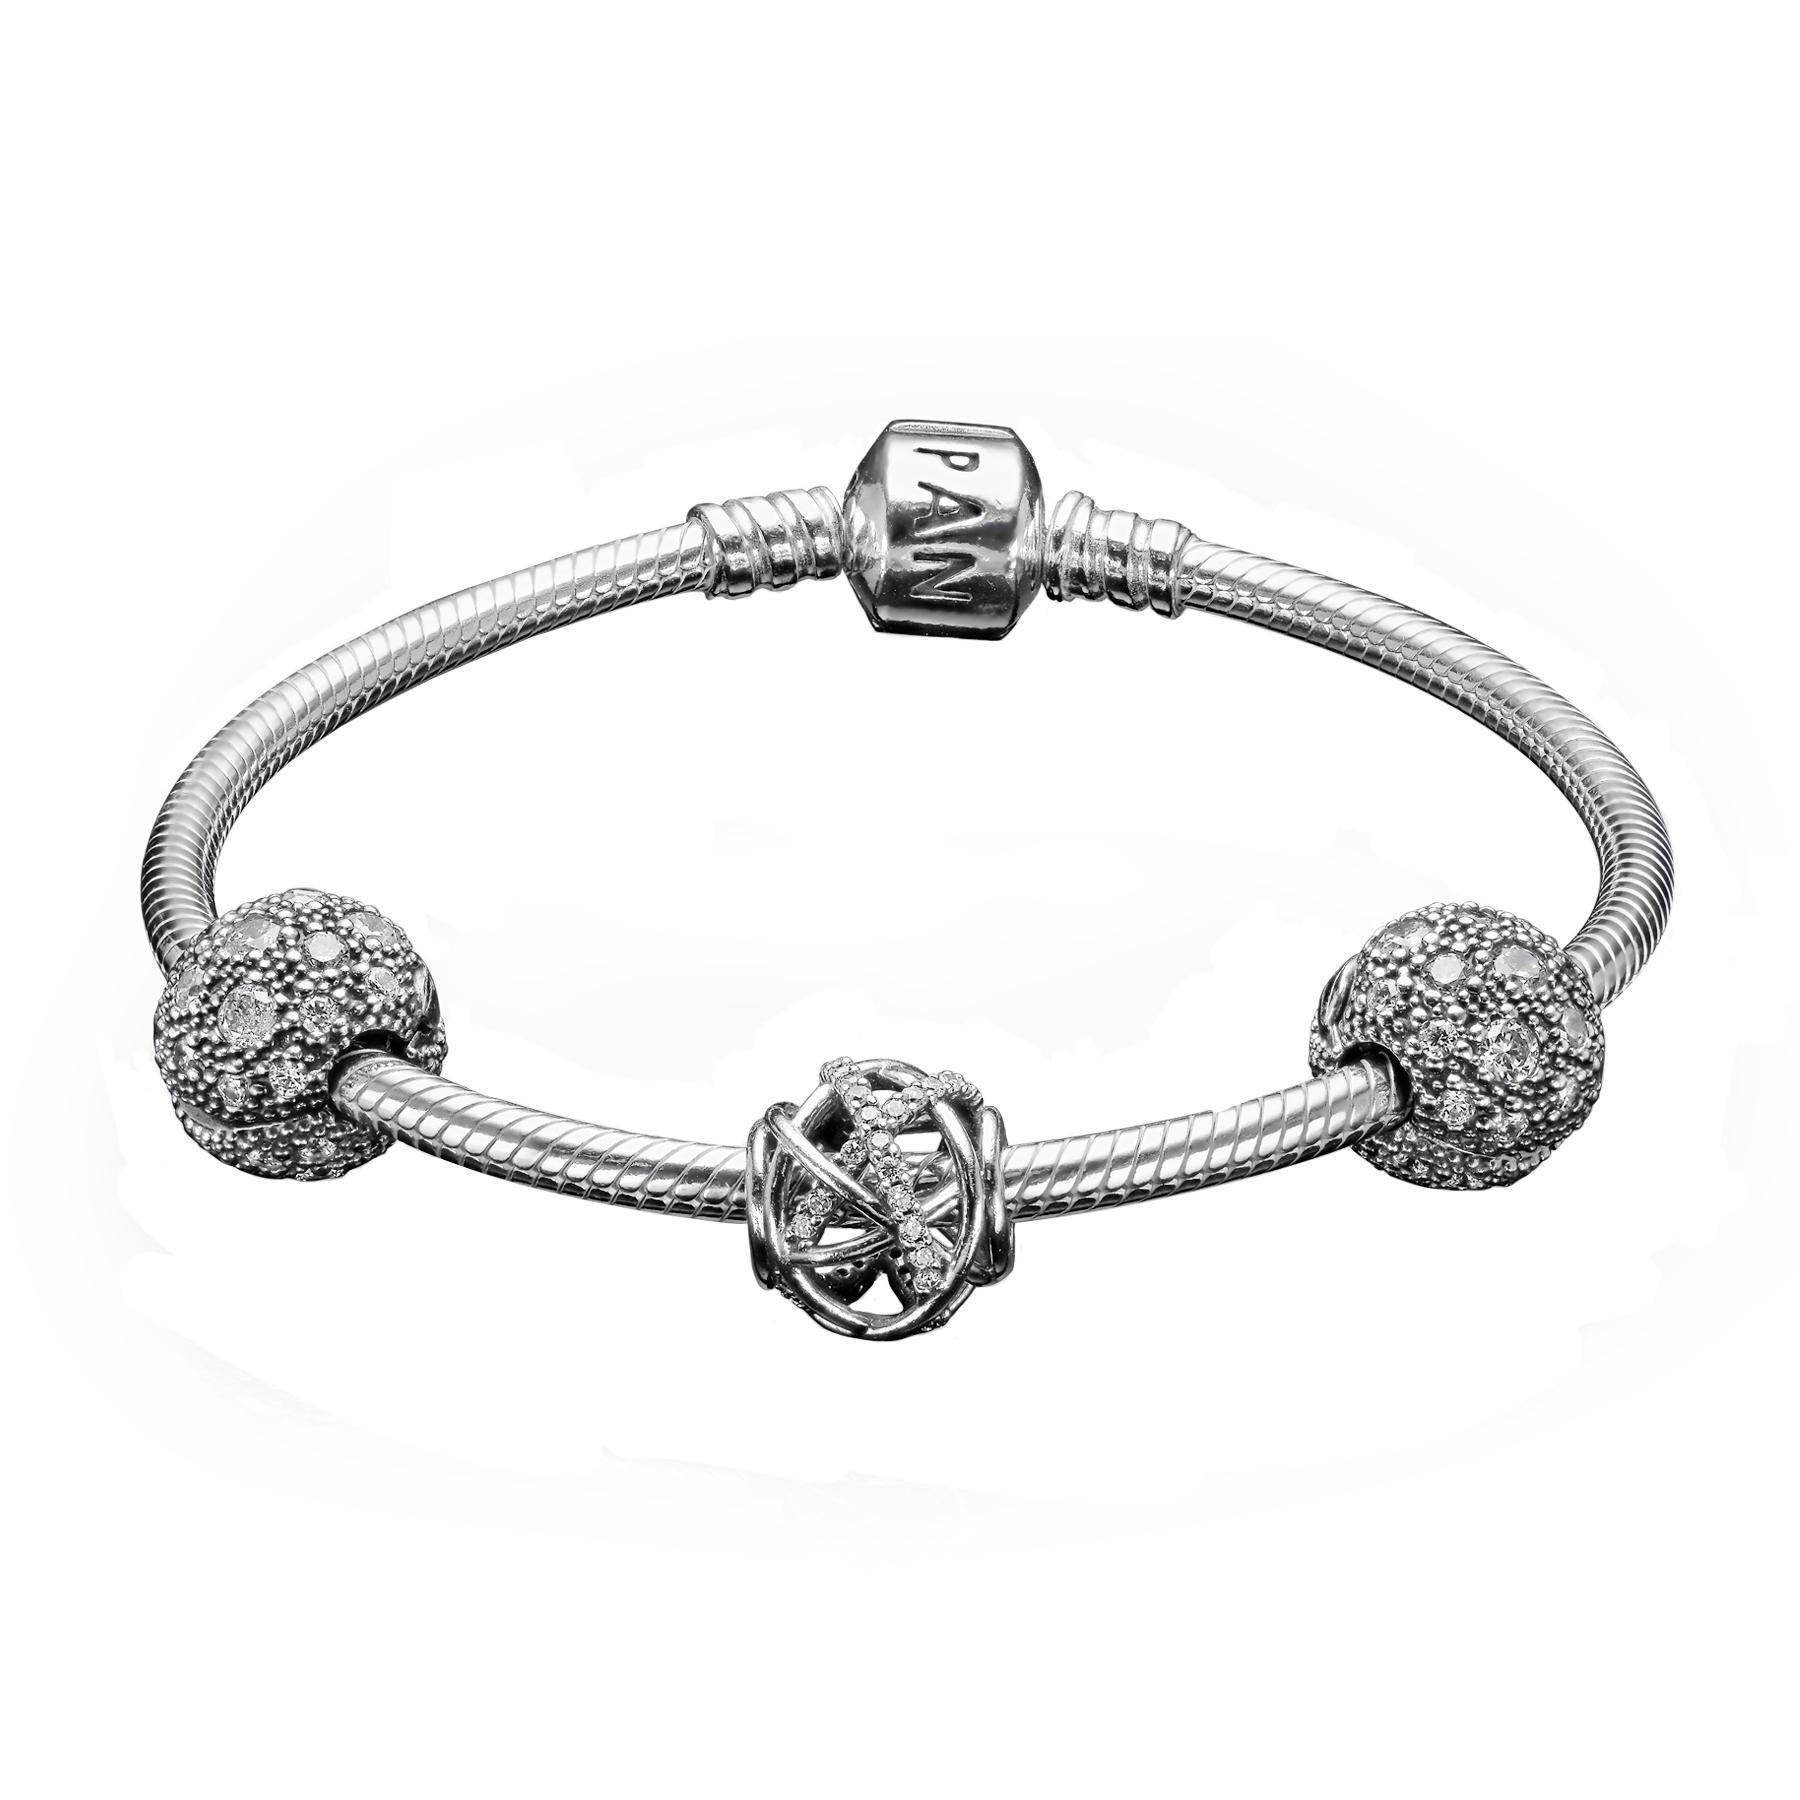 PANDORA Stargazer Gift Set features a sterling silver